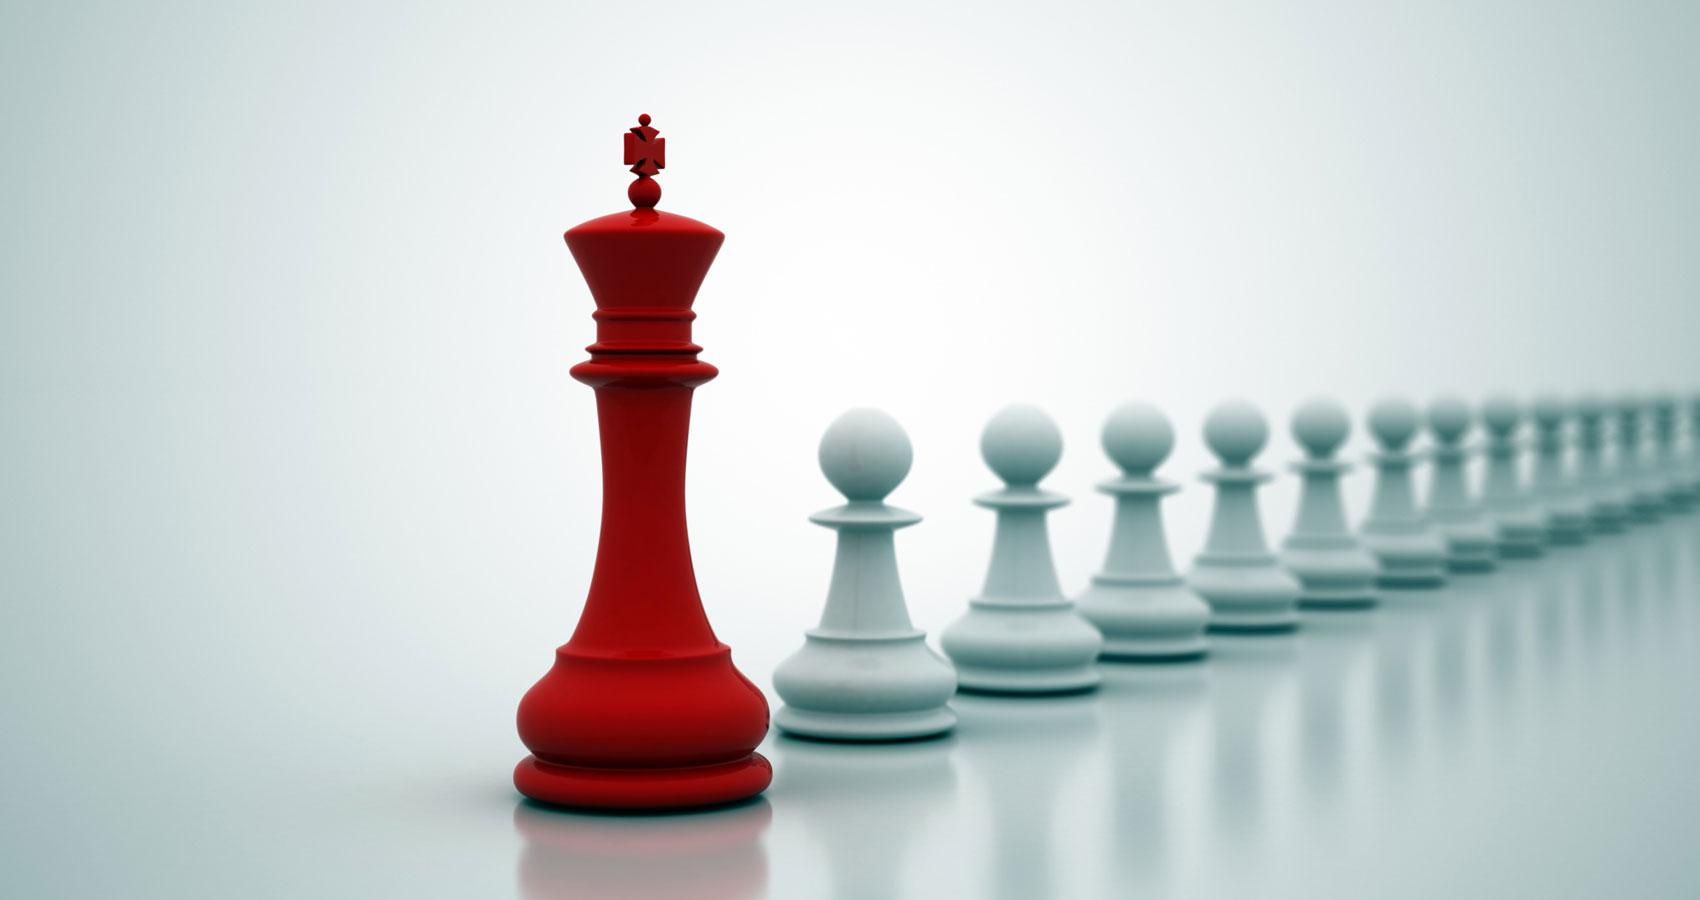 A Great Leader (I Believe) by Dirk Sandarupa at Spillwords.com